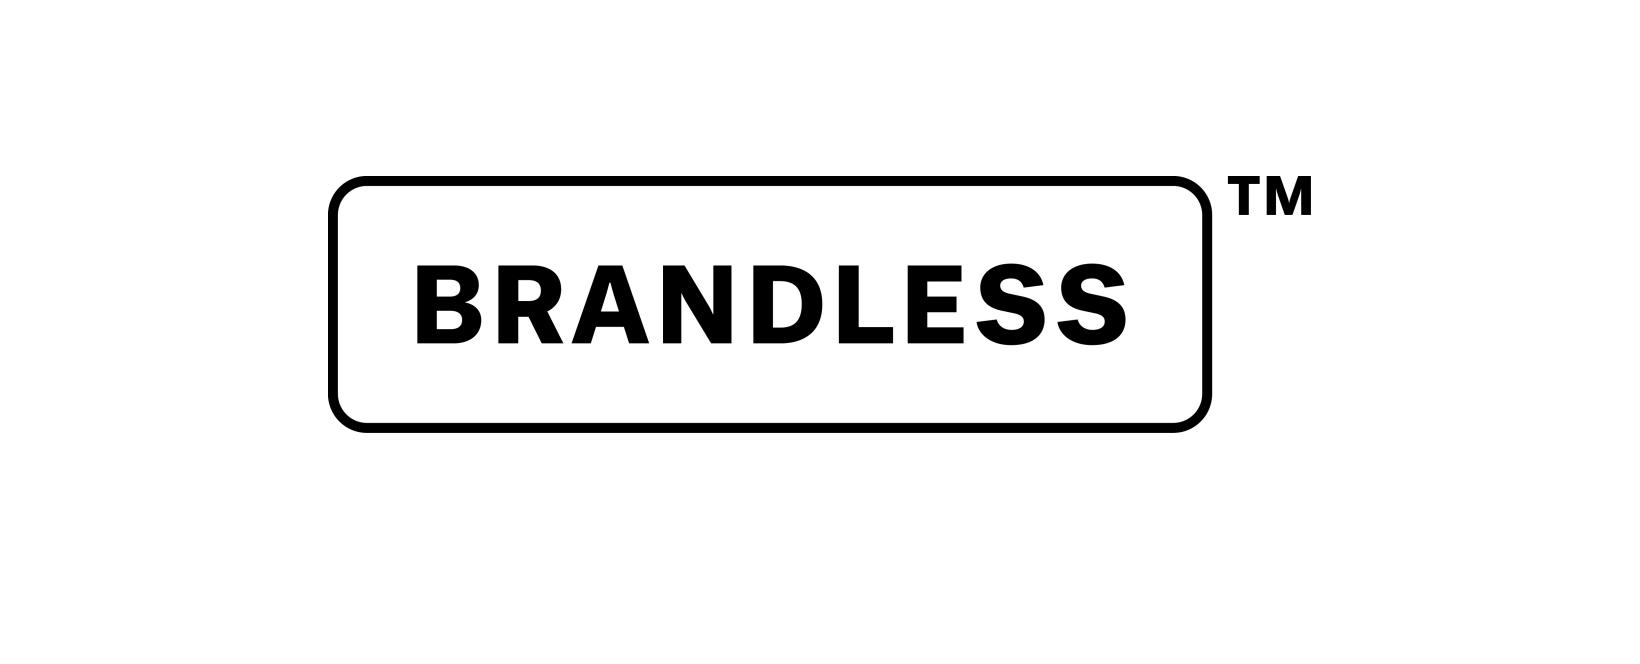 Brandless Discount Code 2021